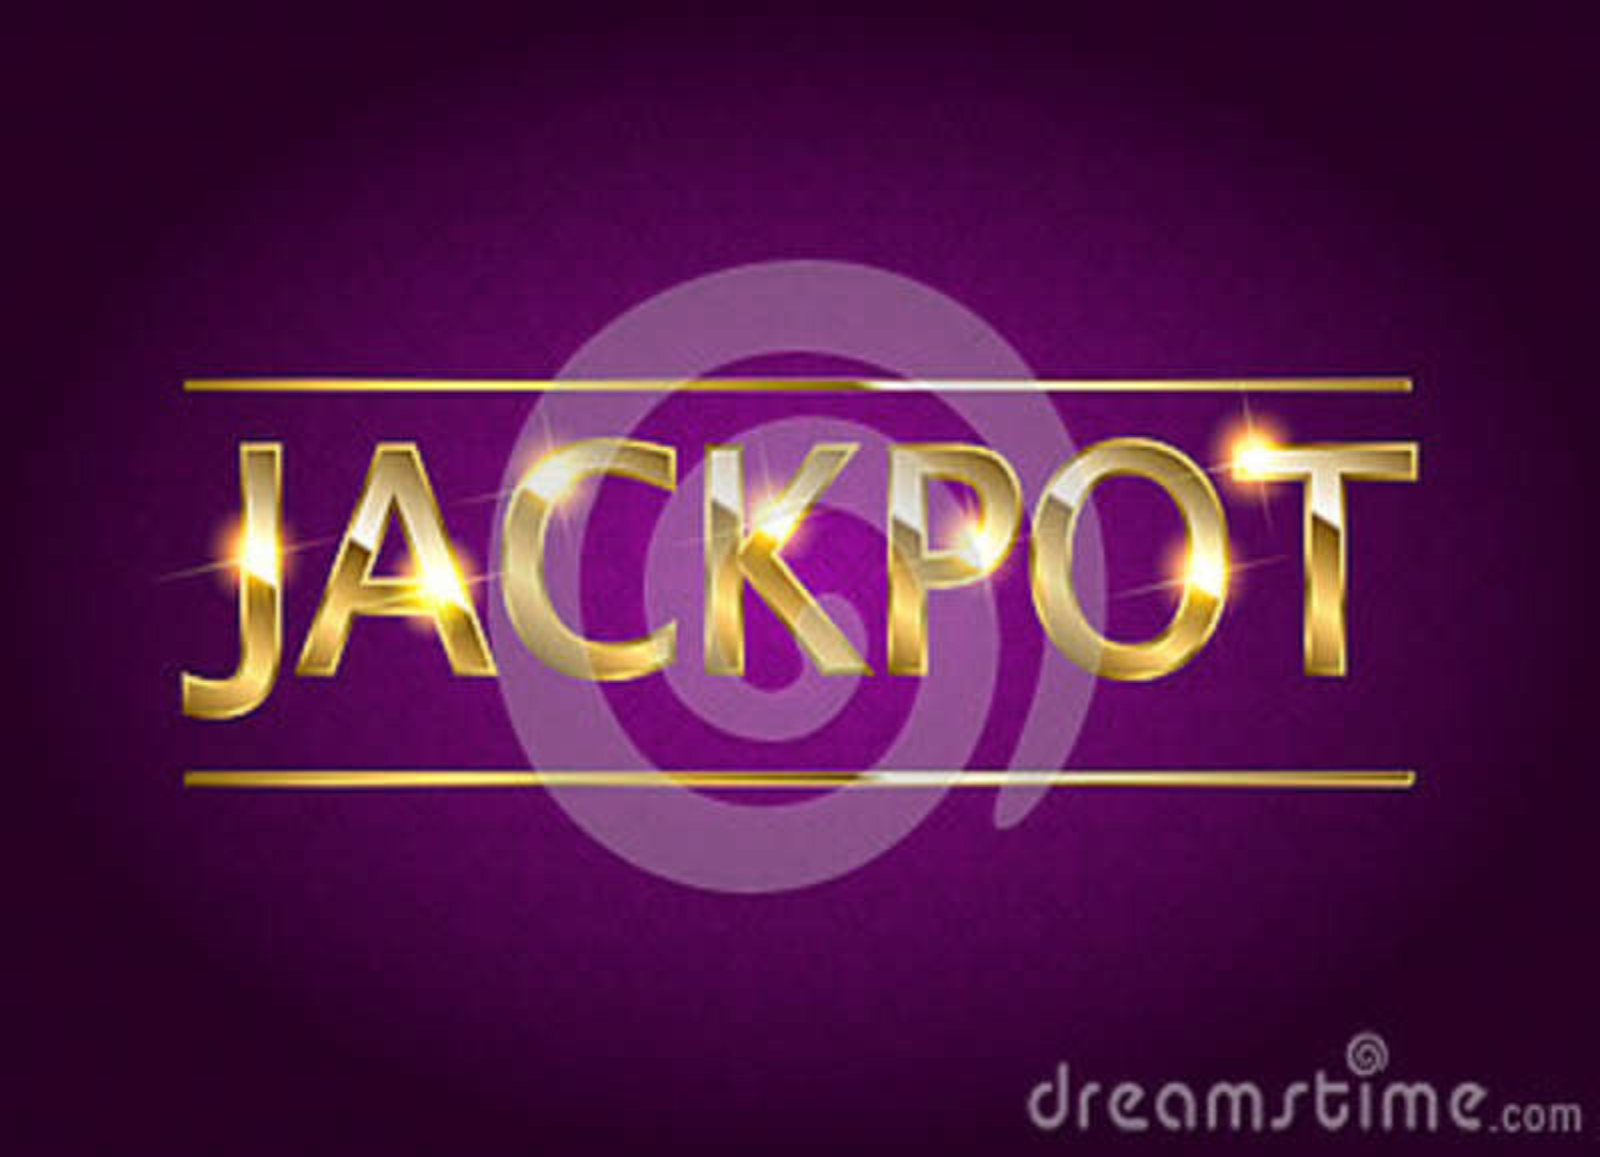 Jackpot retro banner.